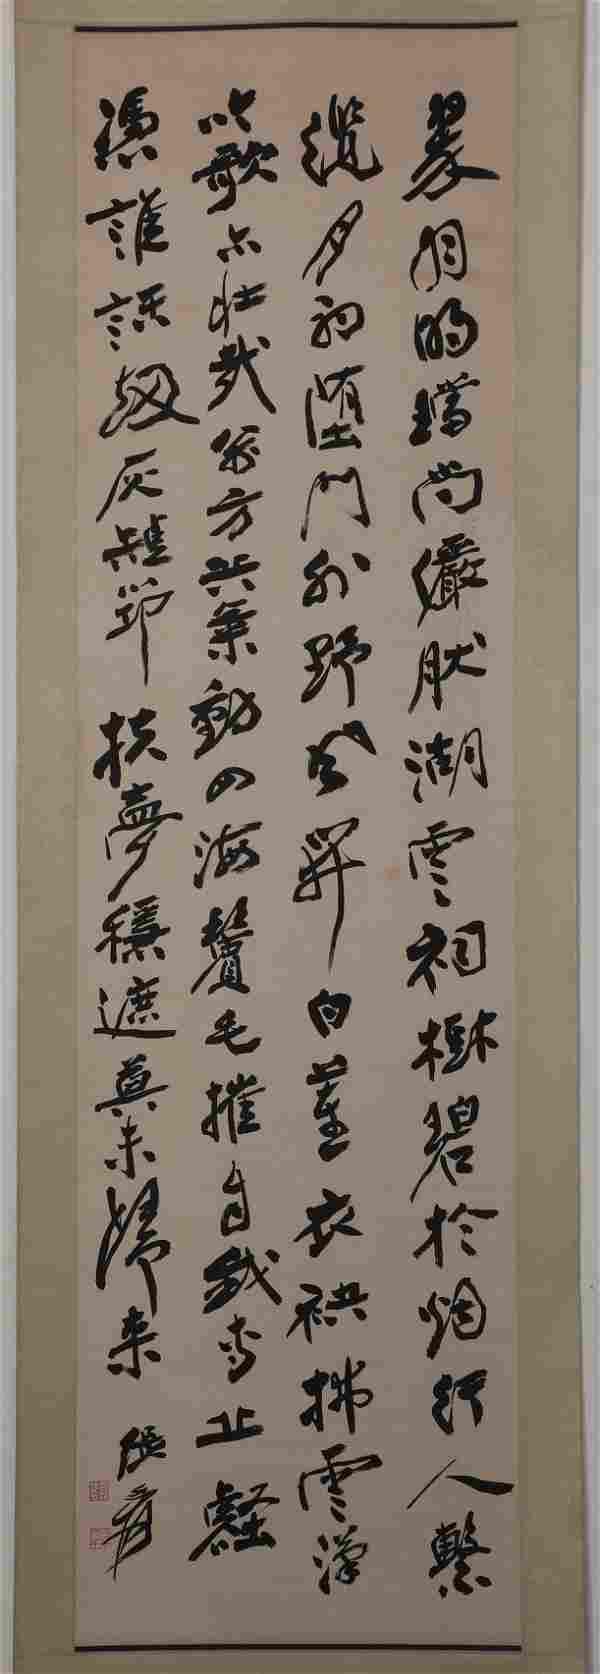 Chinese ink painting Zhang Daqian's calligraphy